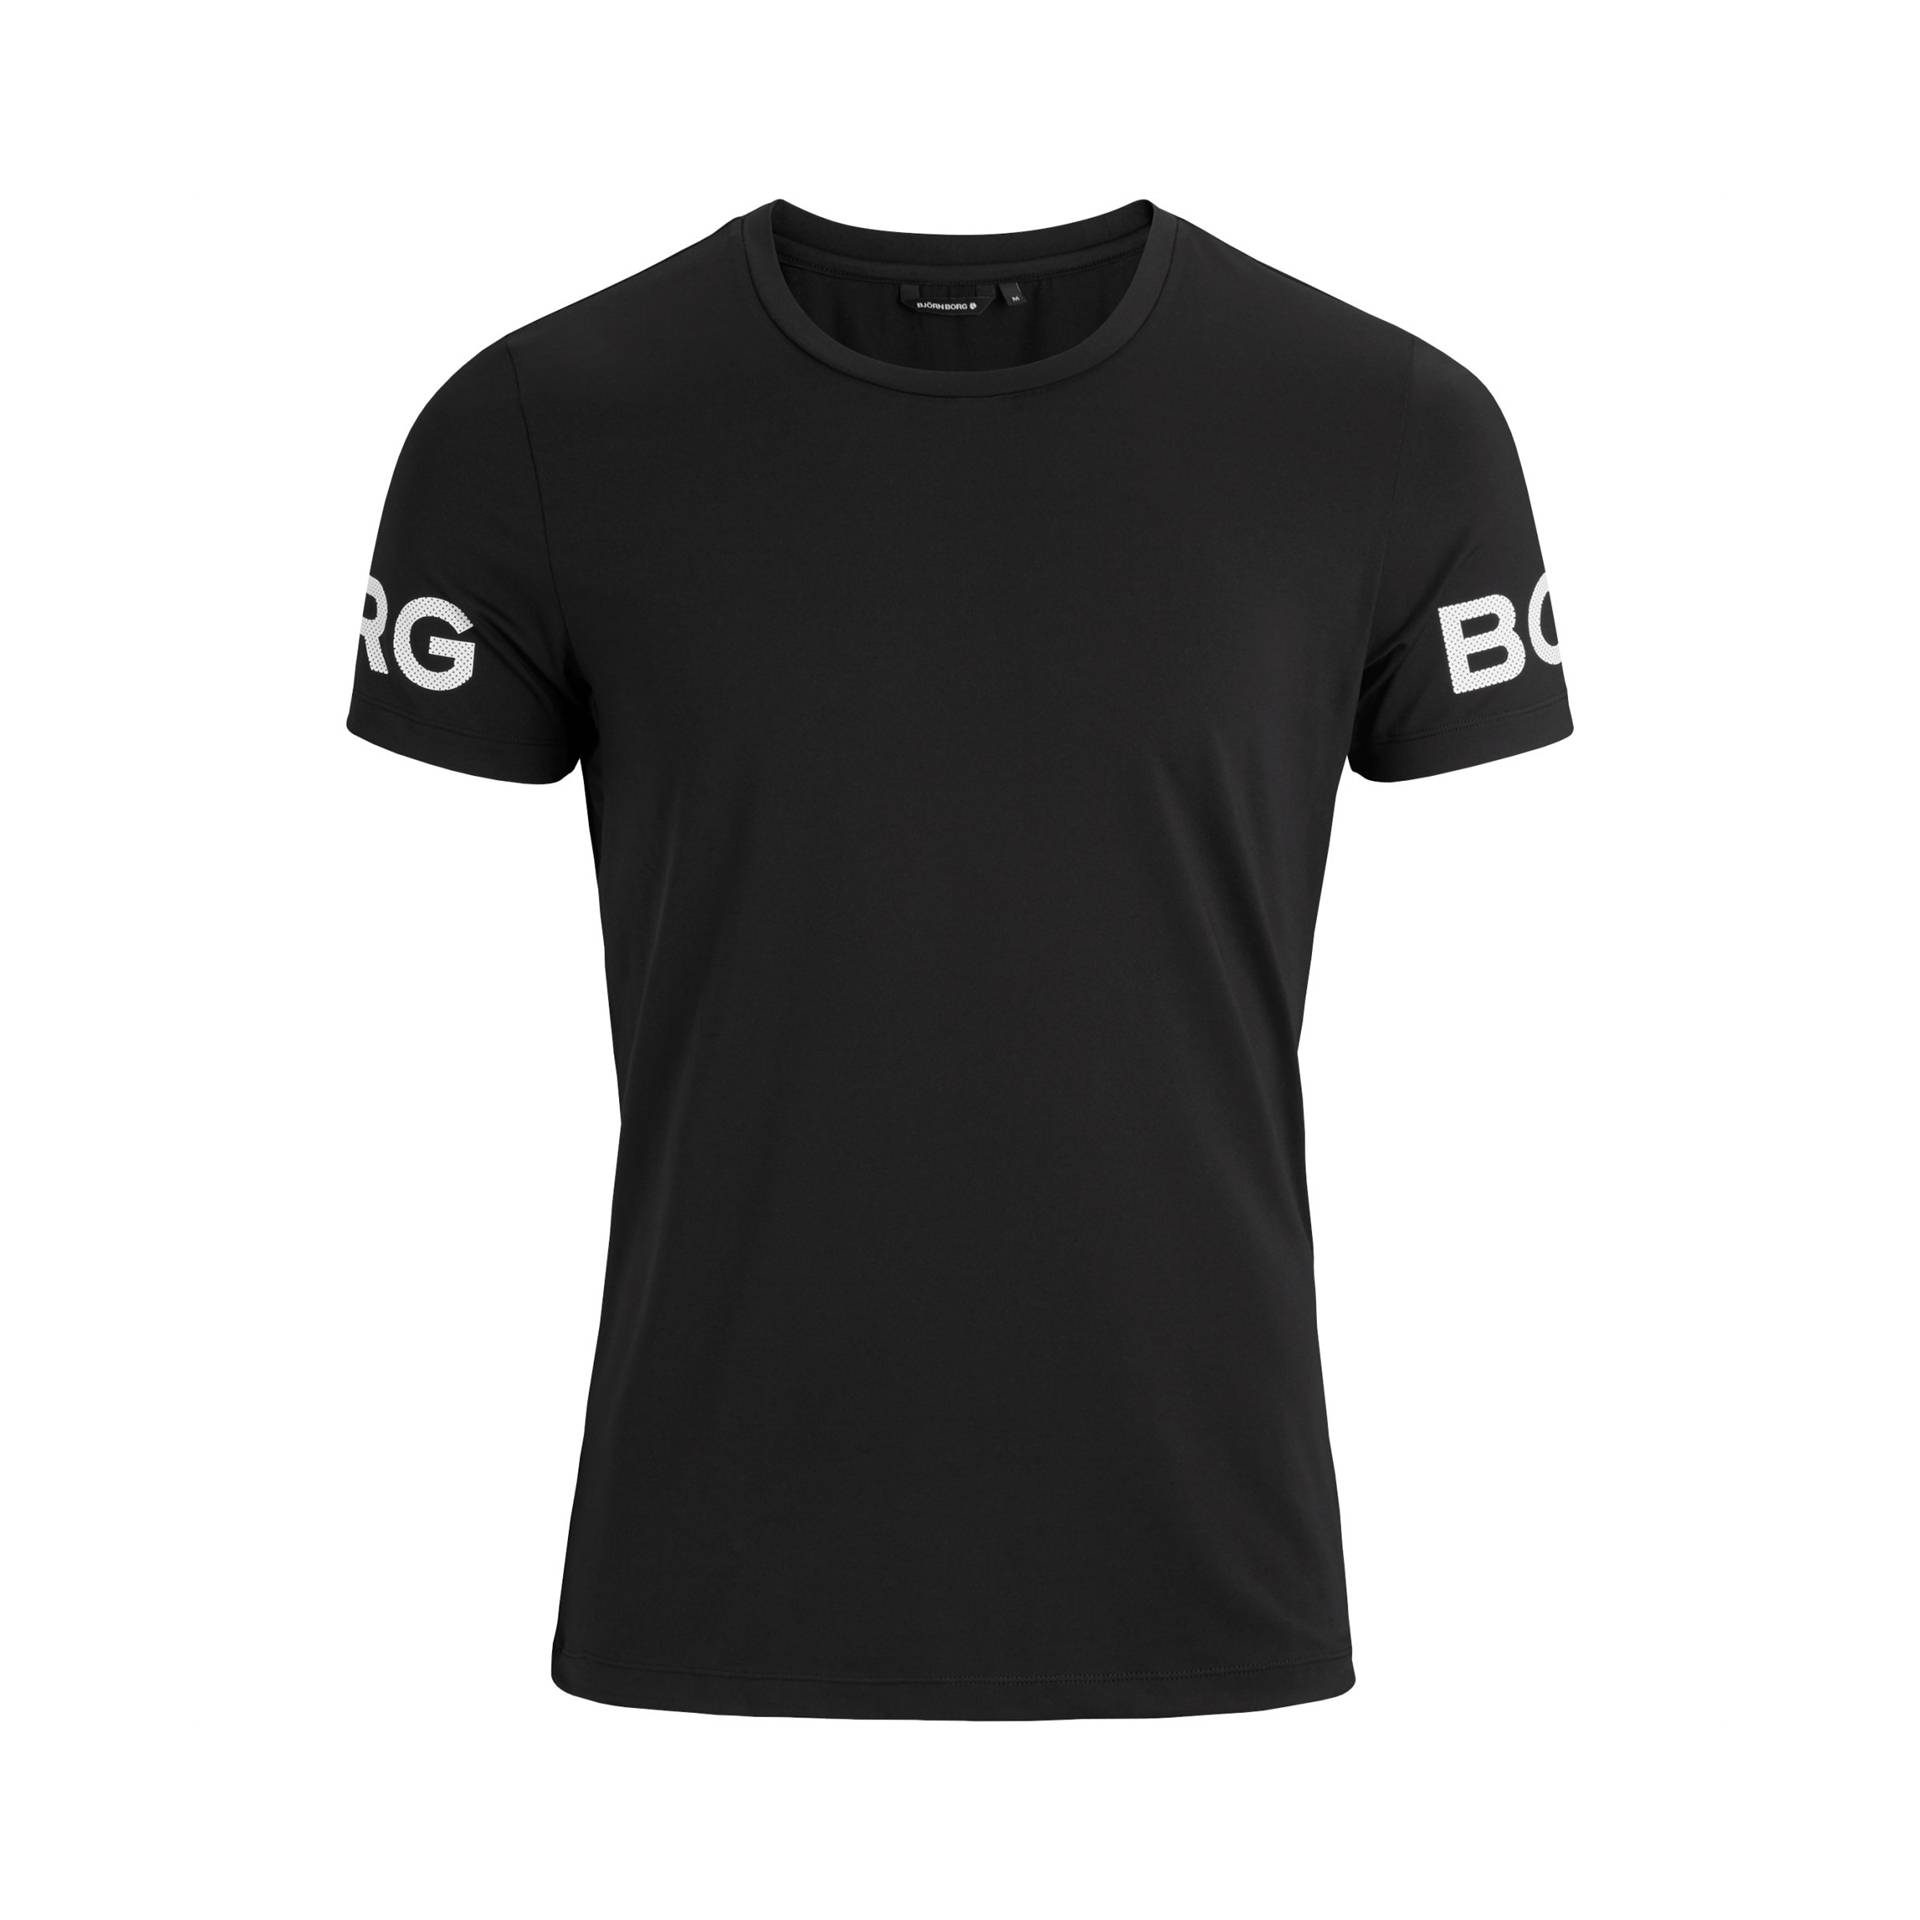 Björn Borg Tee Black Beauty M